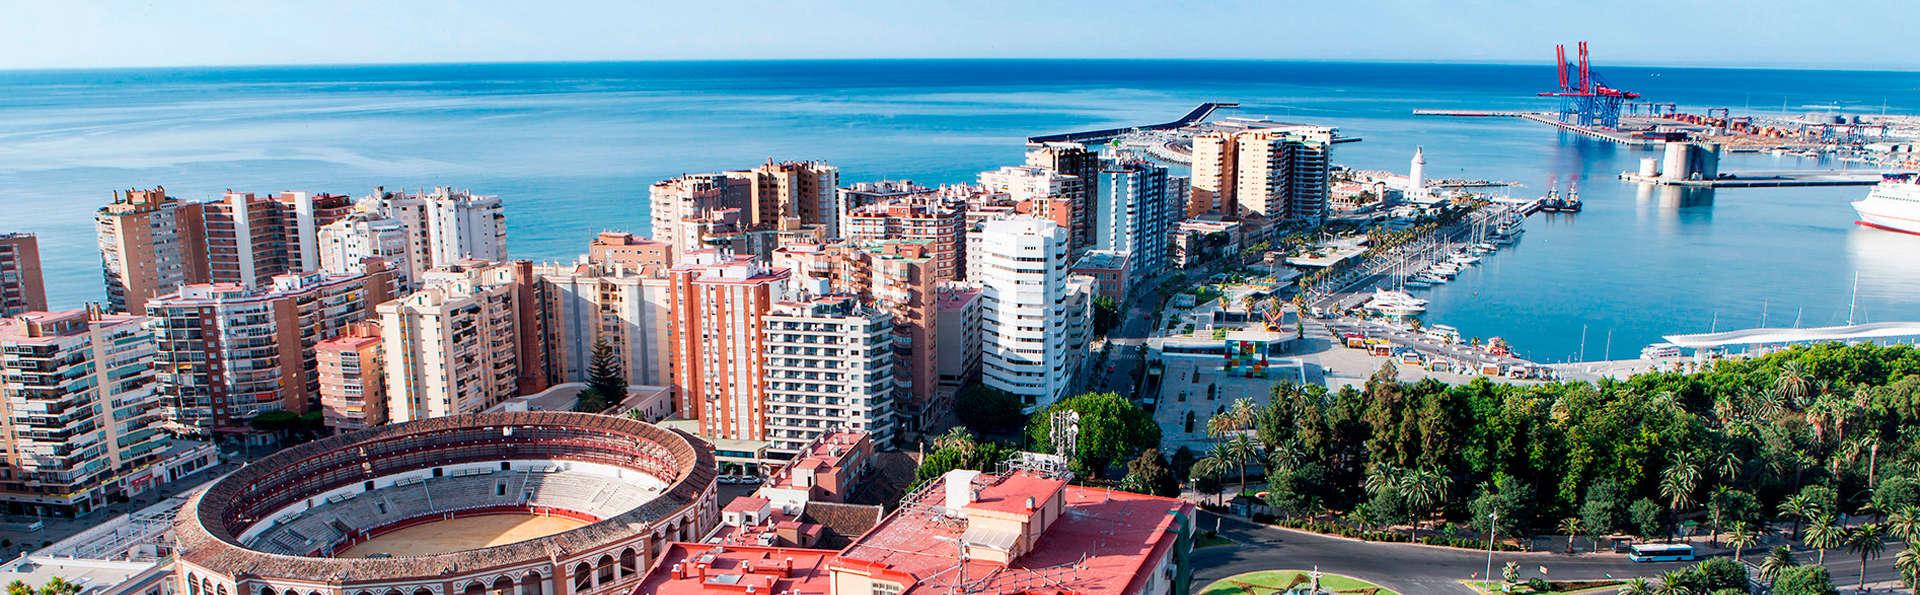 URH - Hilton Garden Inn Málaga - edit_malaga.jpg